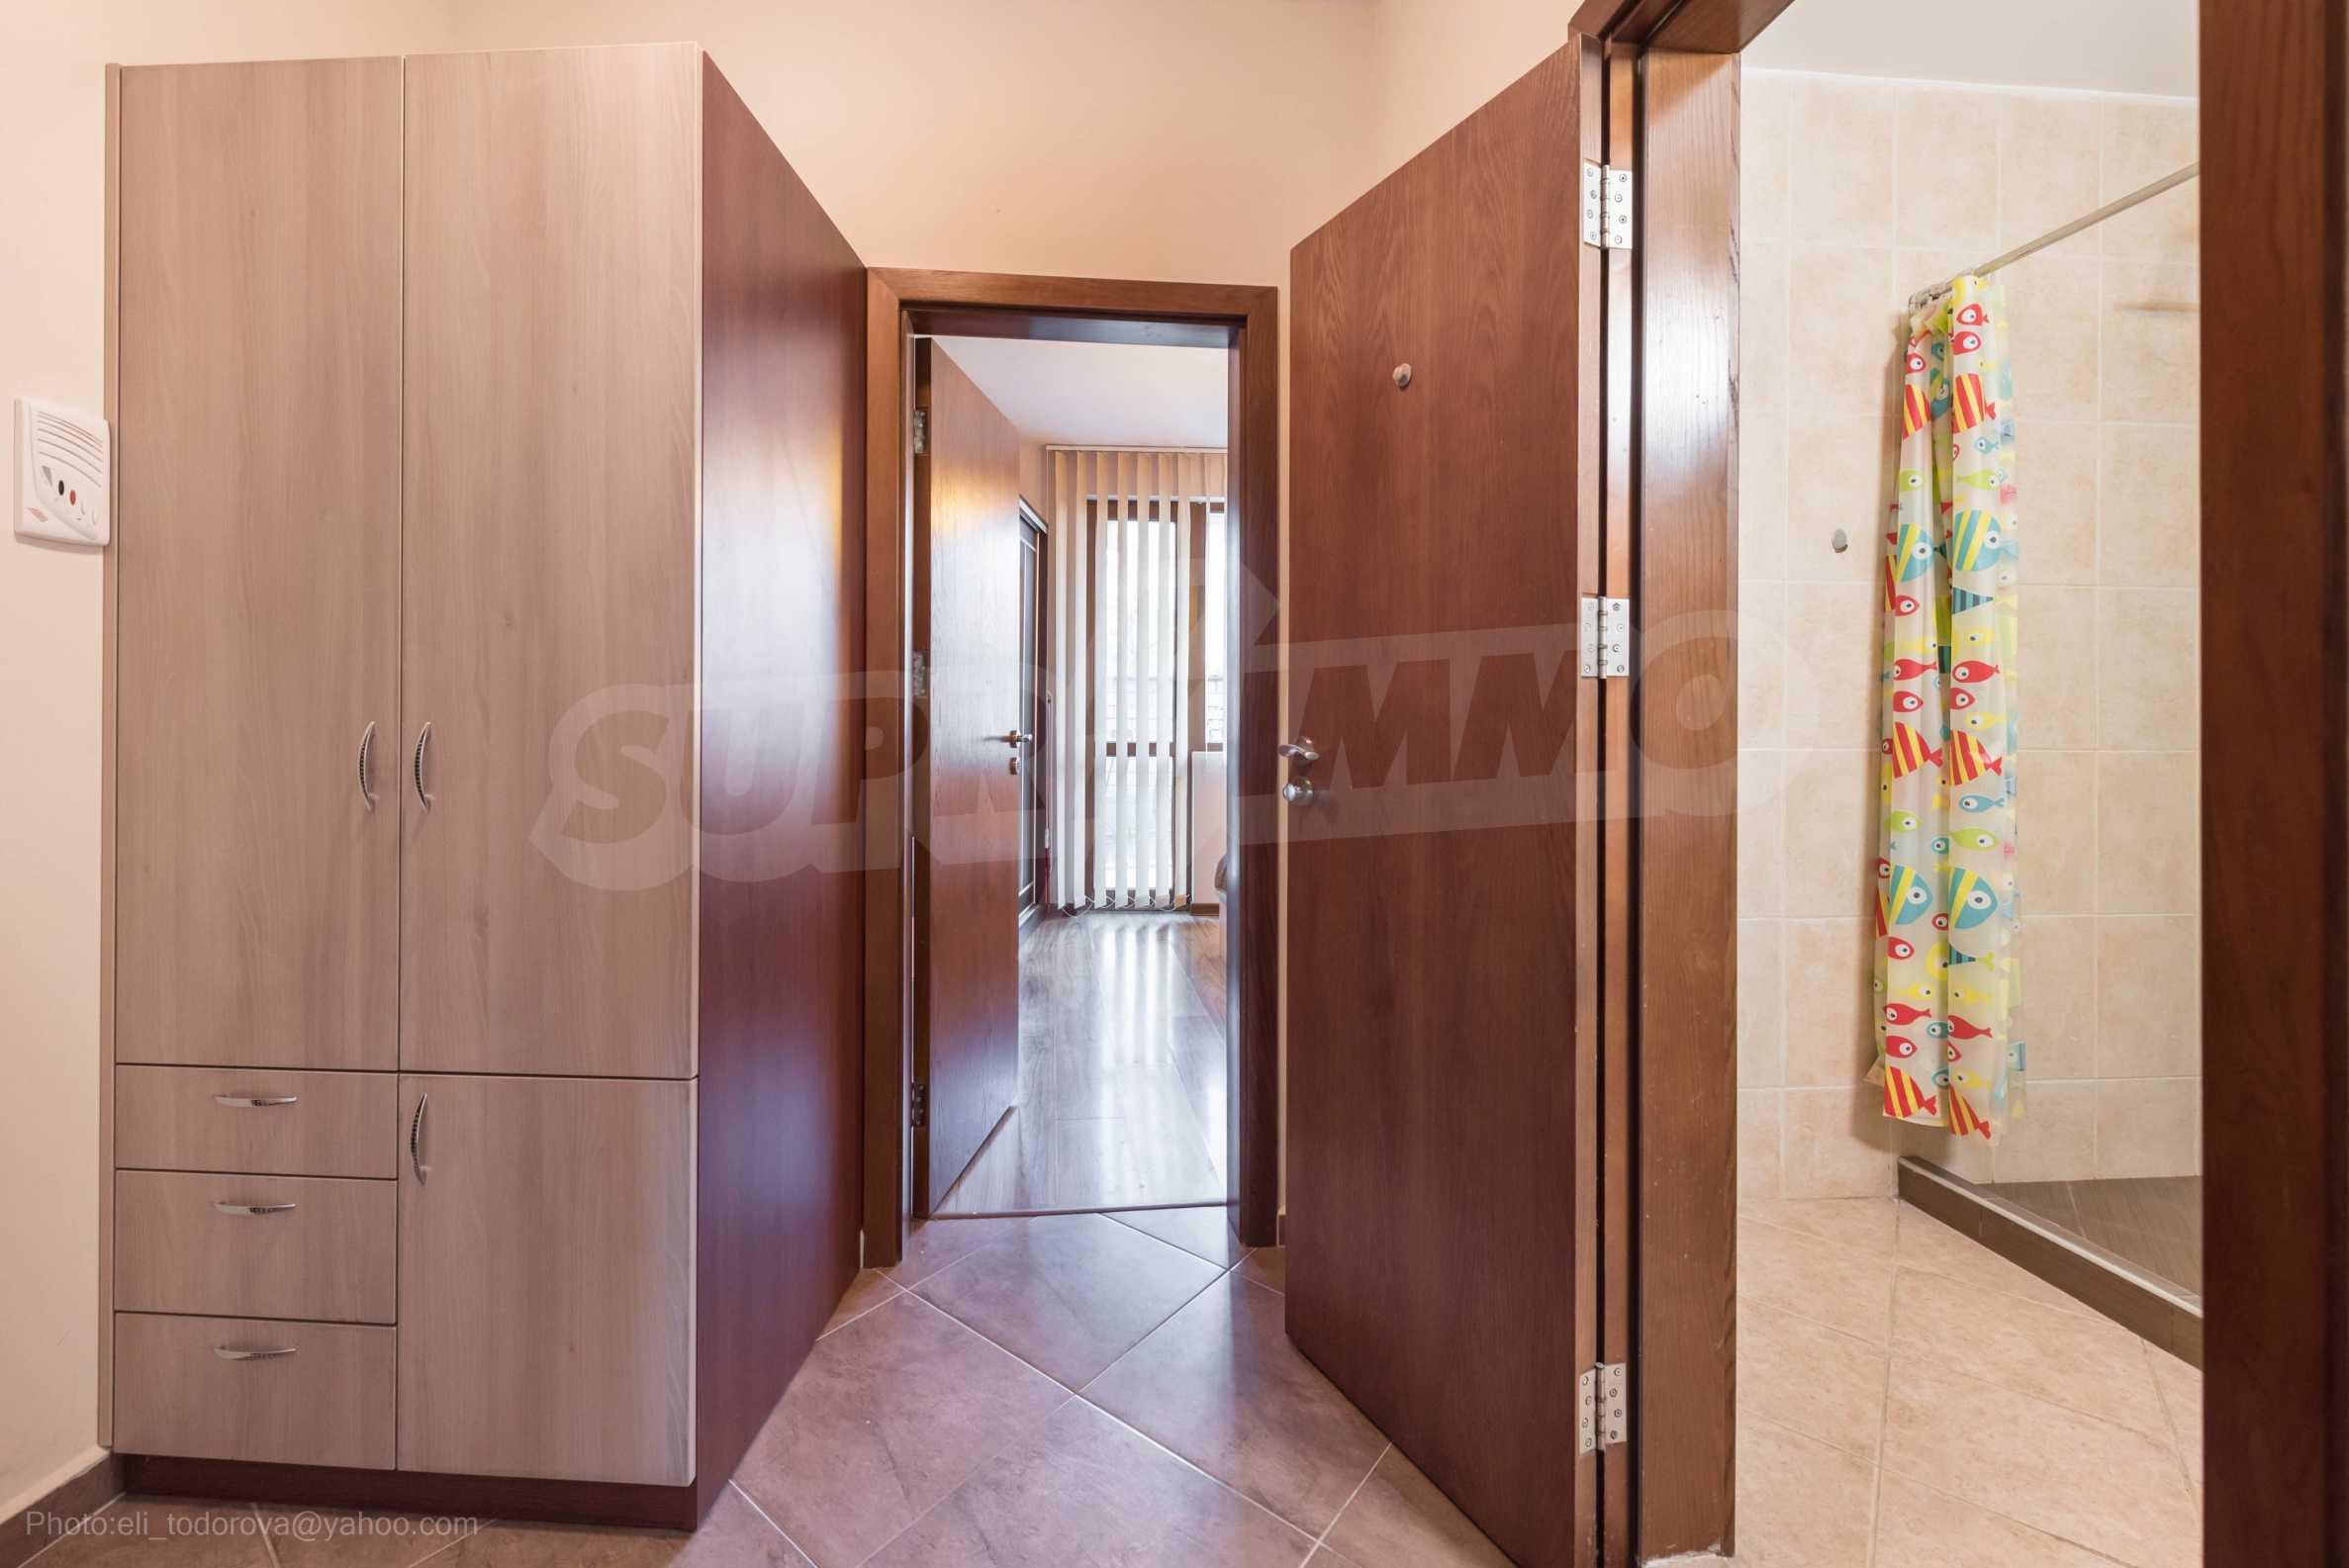 Квартира в аренду в Варне 10